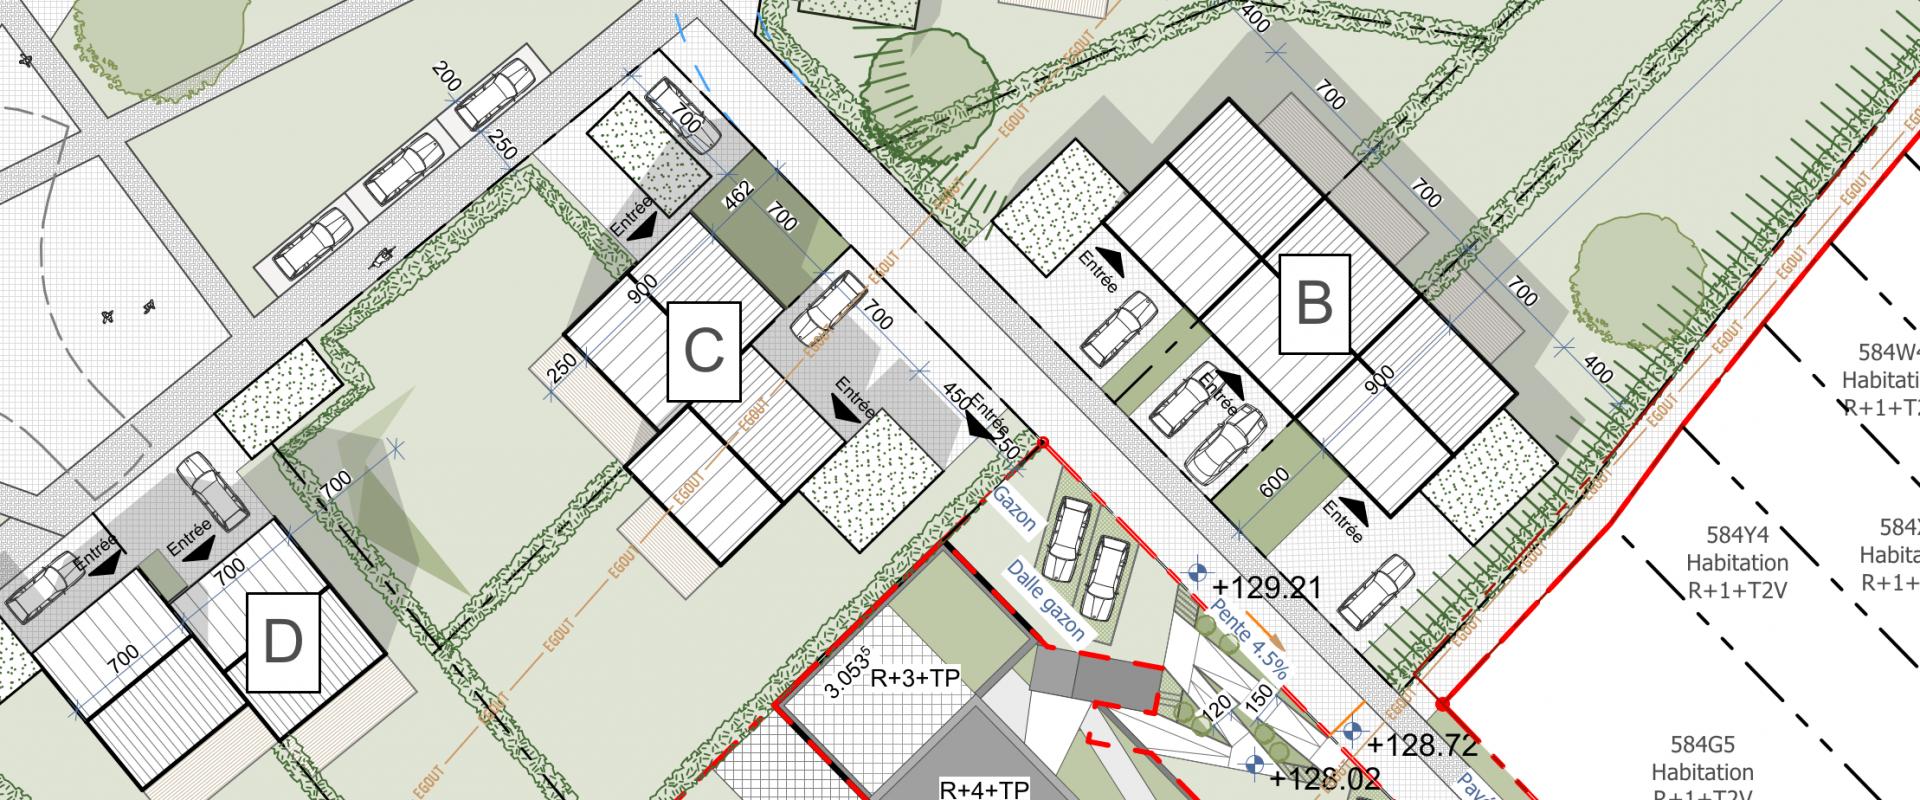 Urban planning | ABR Architects - Achitecture Urbanisme